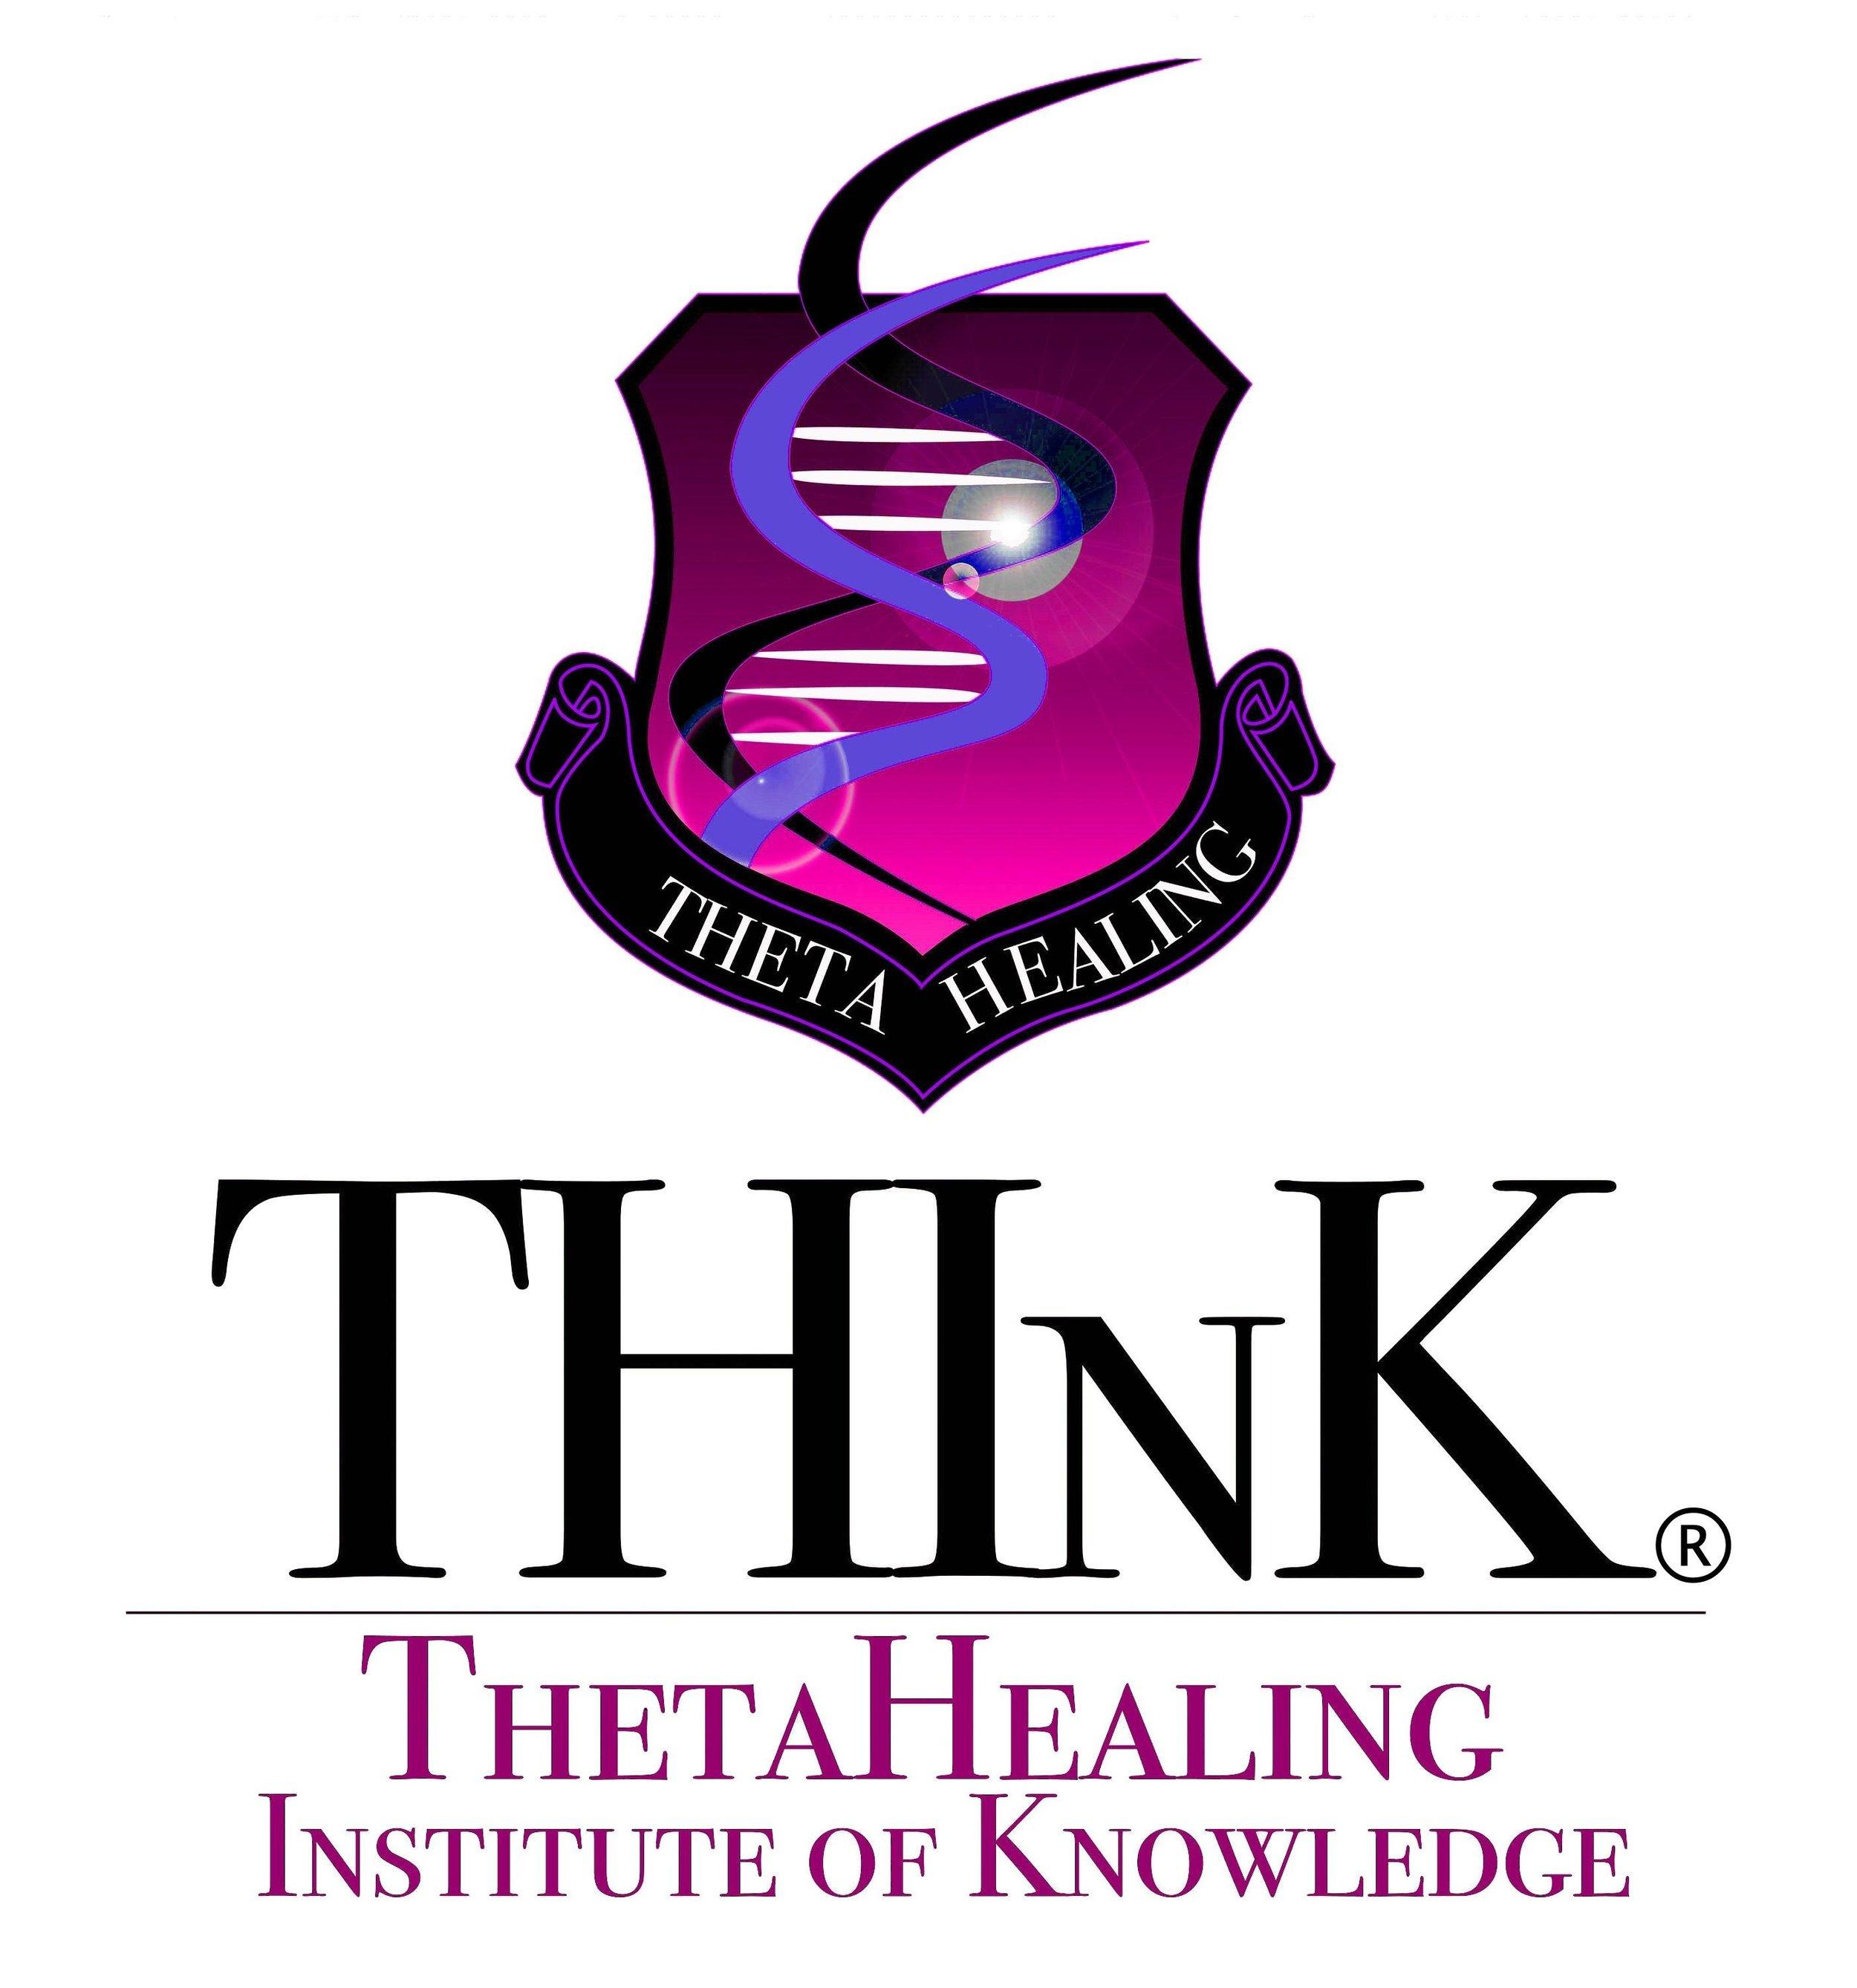 Energy Clearing Seminar in Hawaii - ThetaHealing Seminar Hawaii